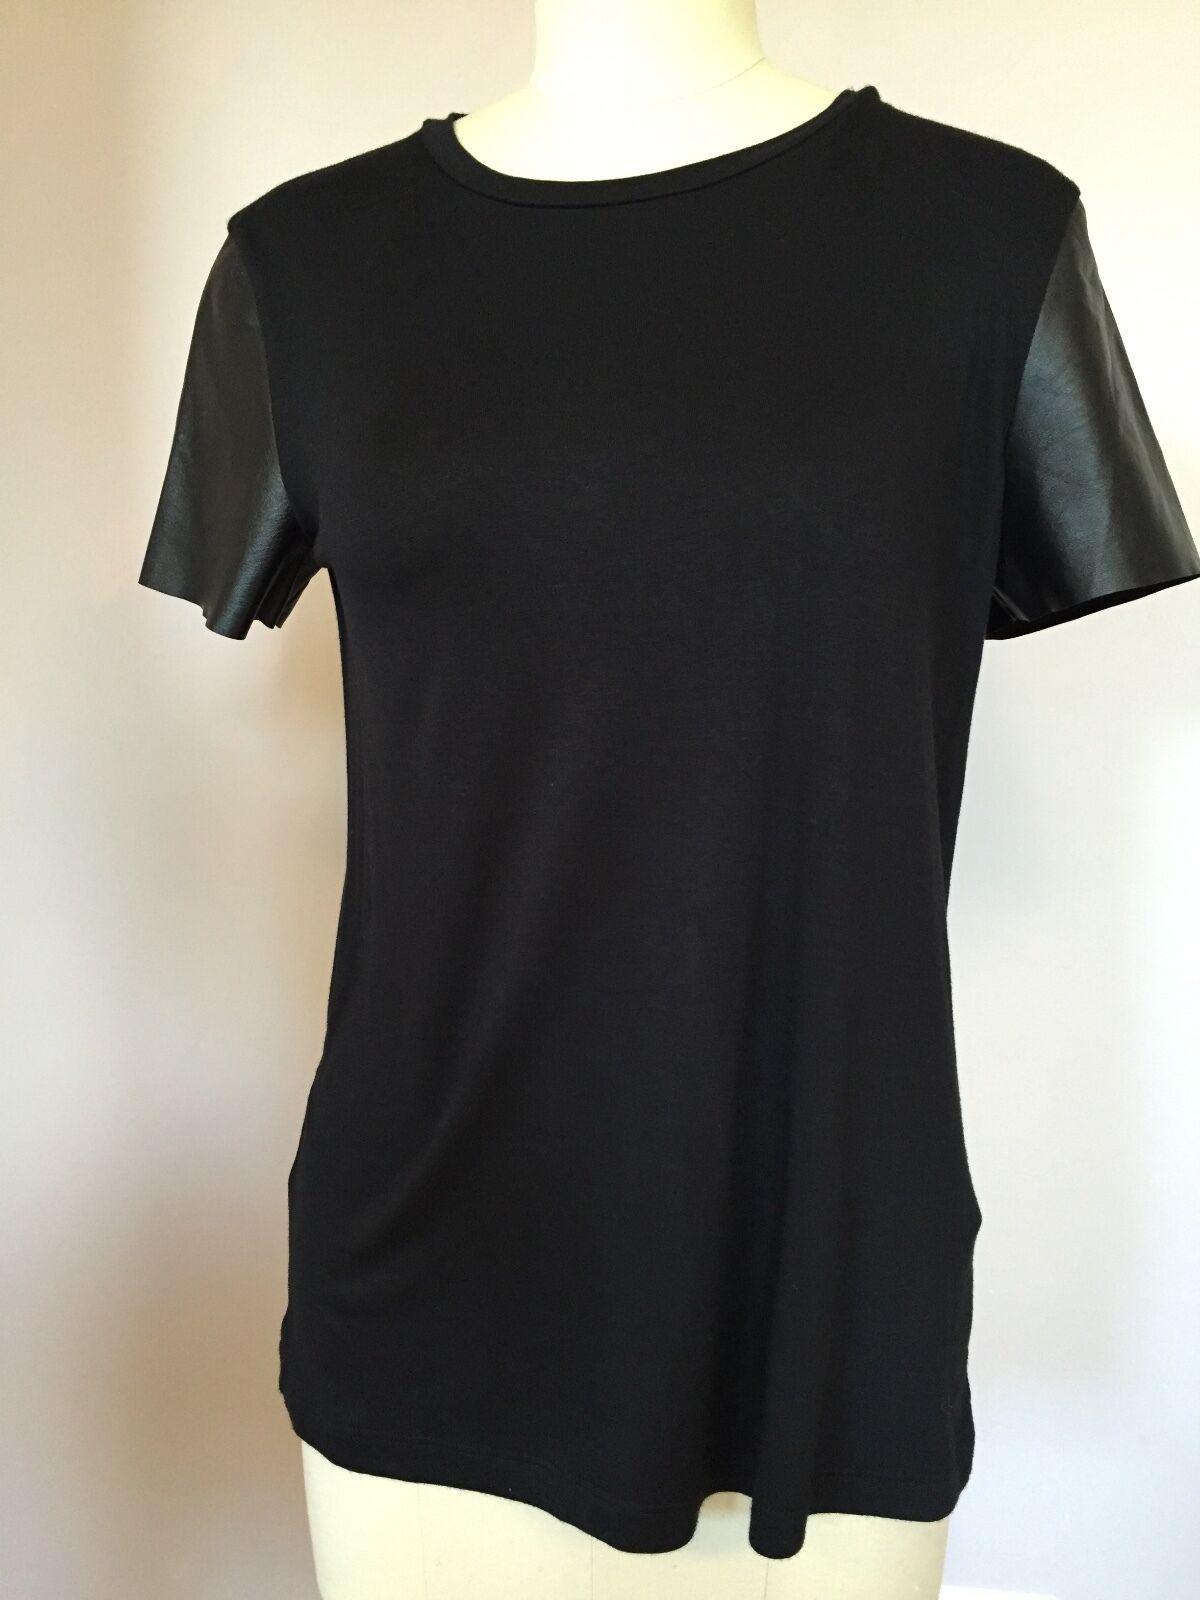 Suzi Roher sz Medium schwarz tshirt with smooth leather short sleeves EUC